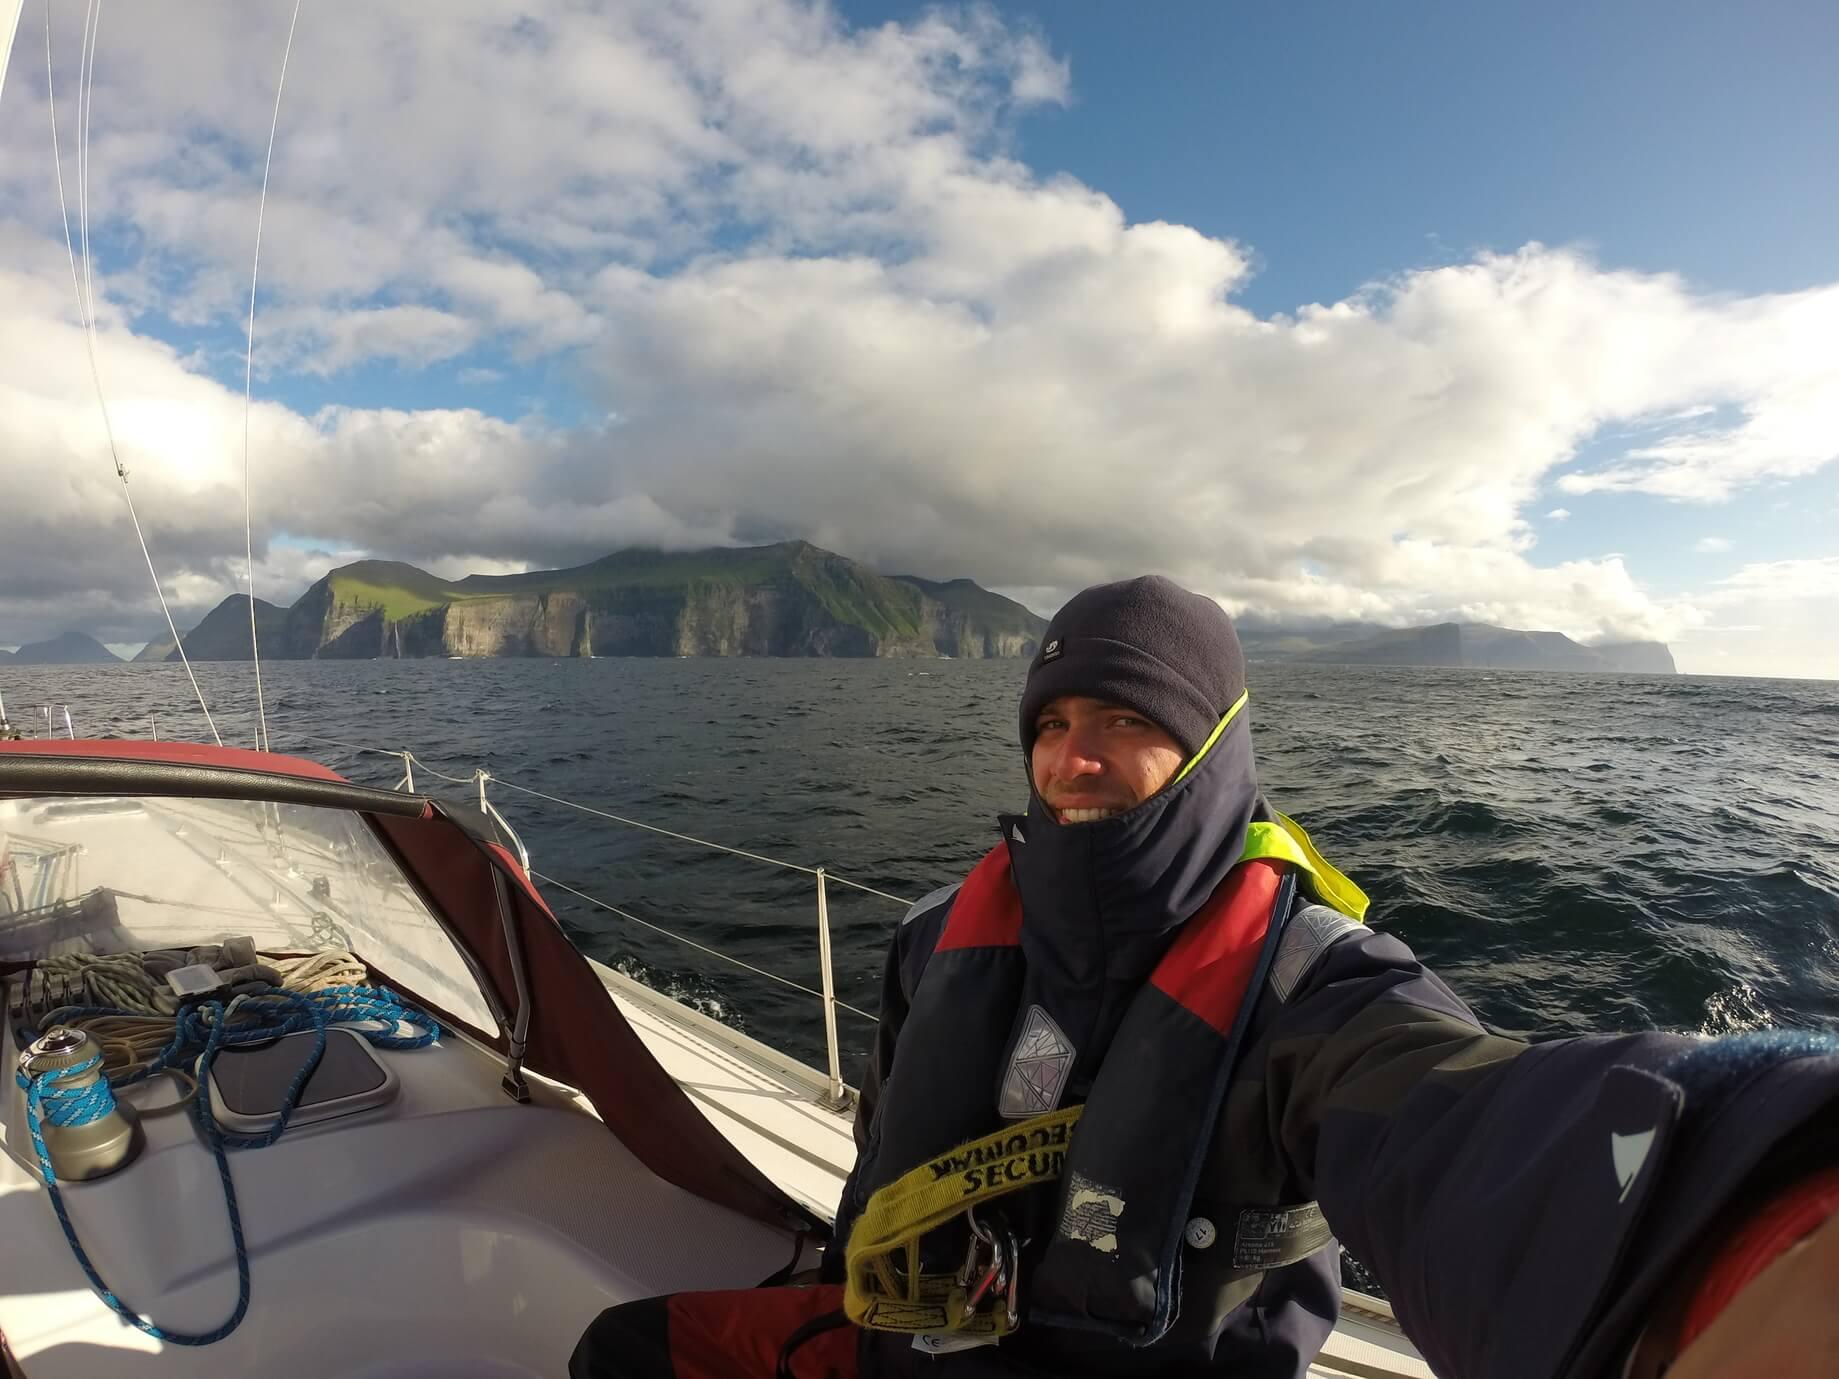 Yannick Kethers sailor